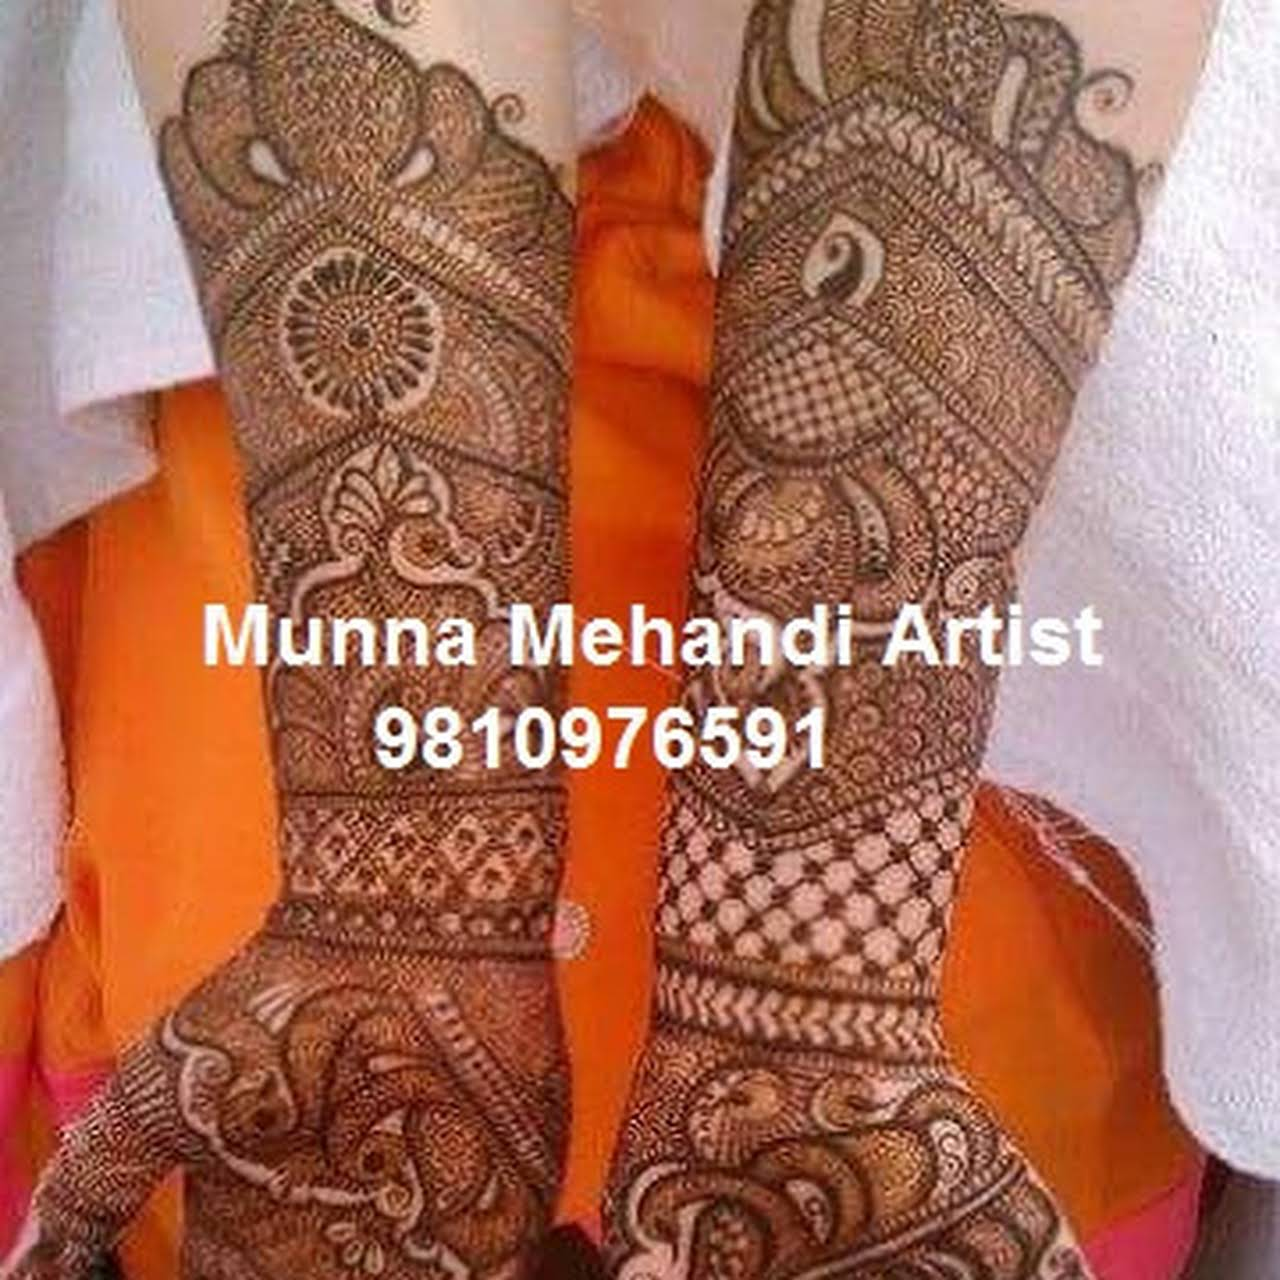 Munna mehandi artist, bridal mehandi, best mehandi designs, mehandi wala, mehndi designer, Wedding marriage mehendi services at home in uttam nagar